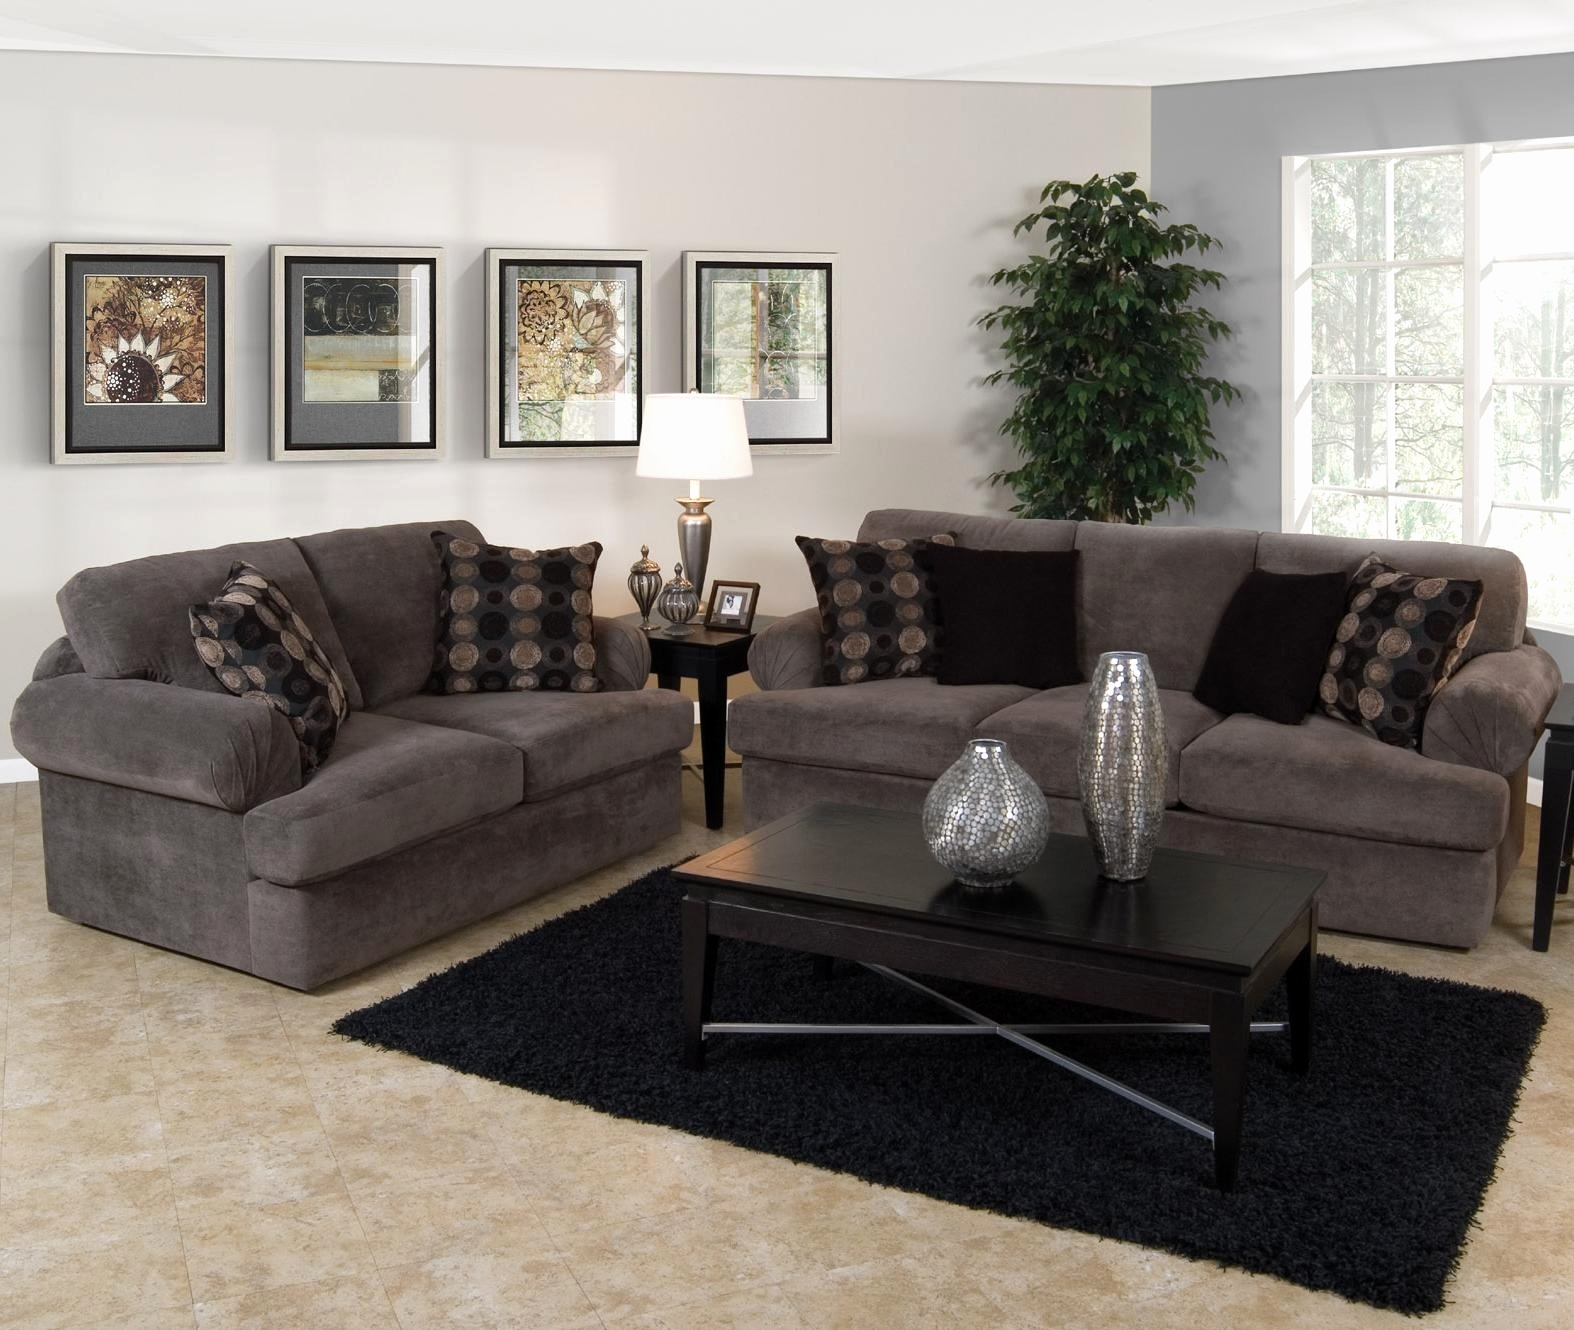 Featured Image of Nova Scotia Sectional Sofas